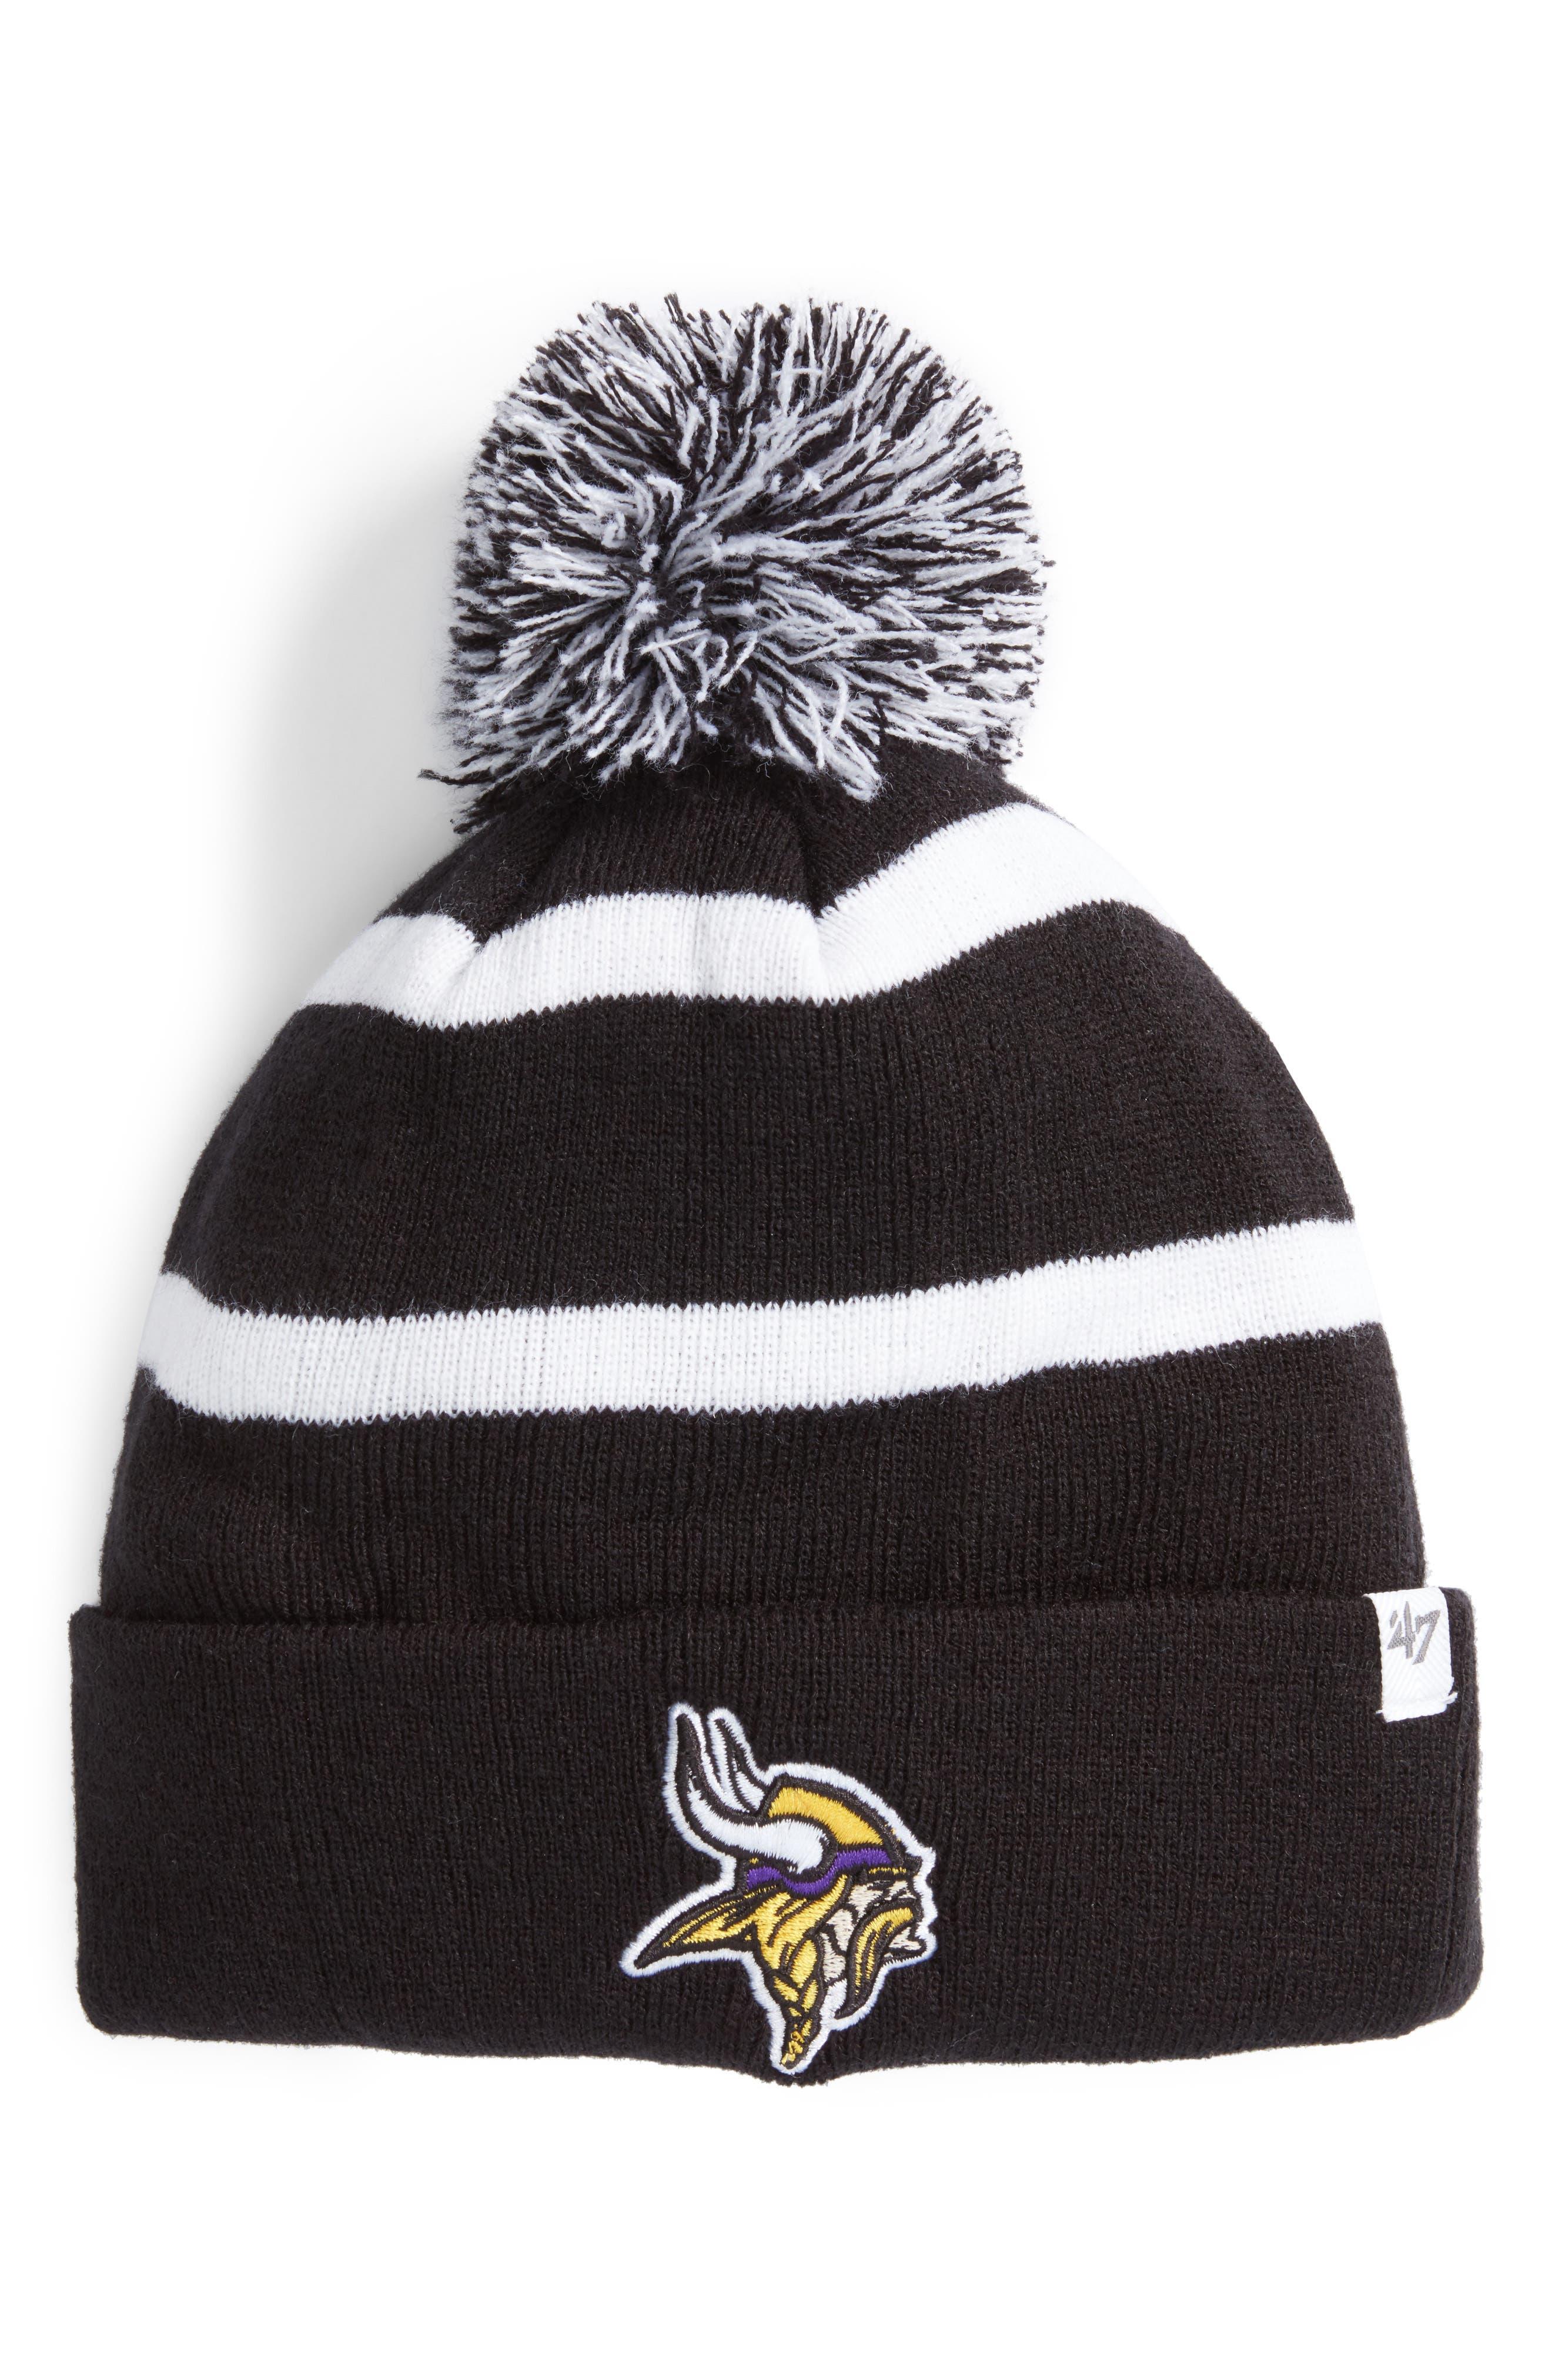 NFL Breakaway Pom Knit Cap,                         Main,                         color,